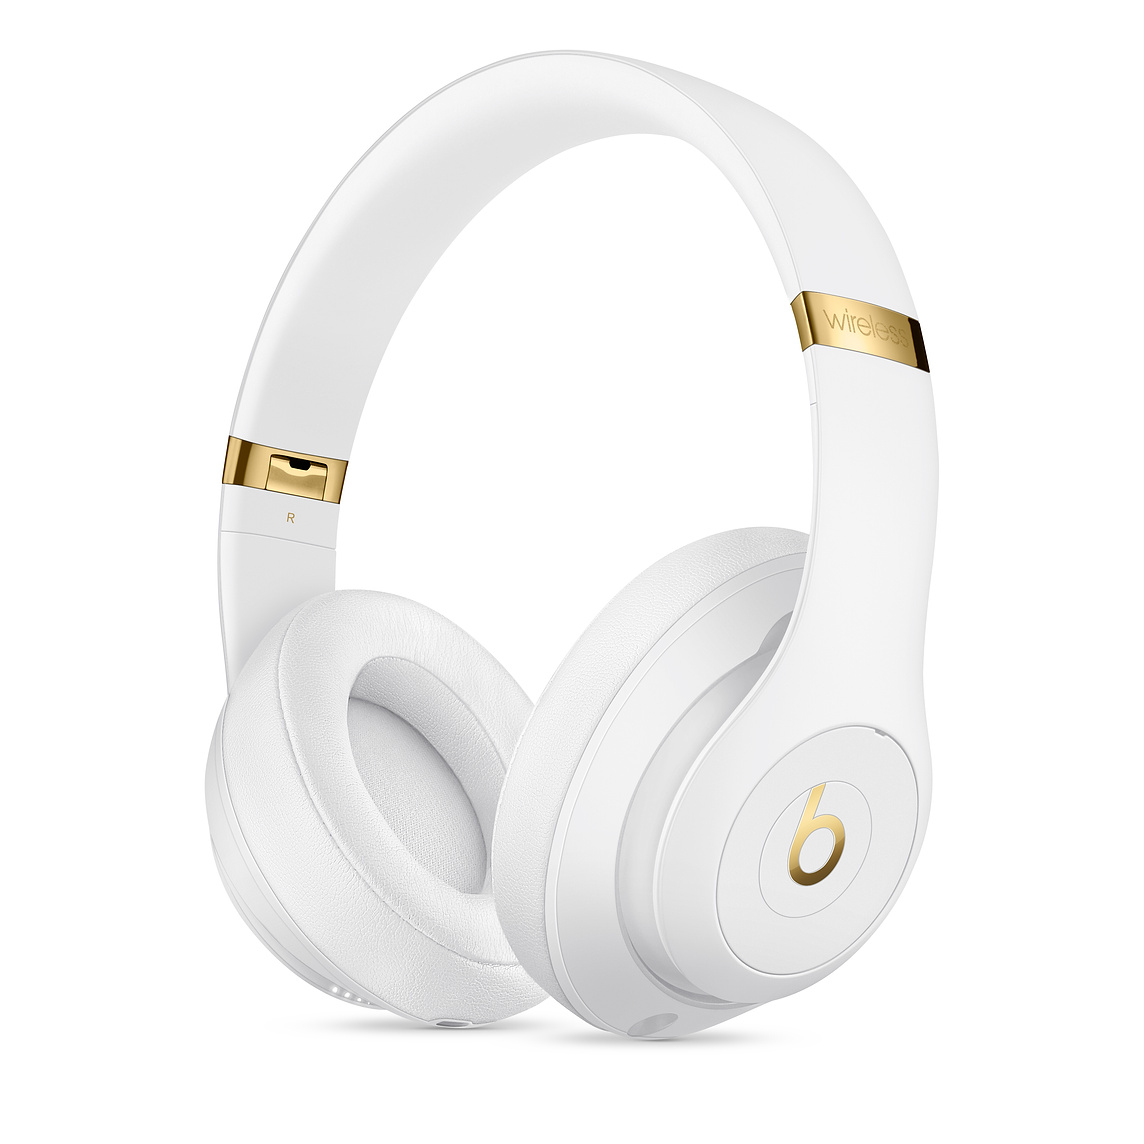 Apple Beats Studio3 무선 오버이어 헤드폰, 화이트, MX3Y2PA/A